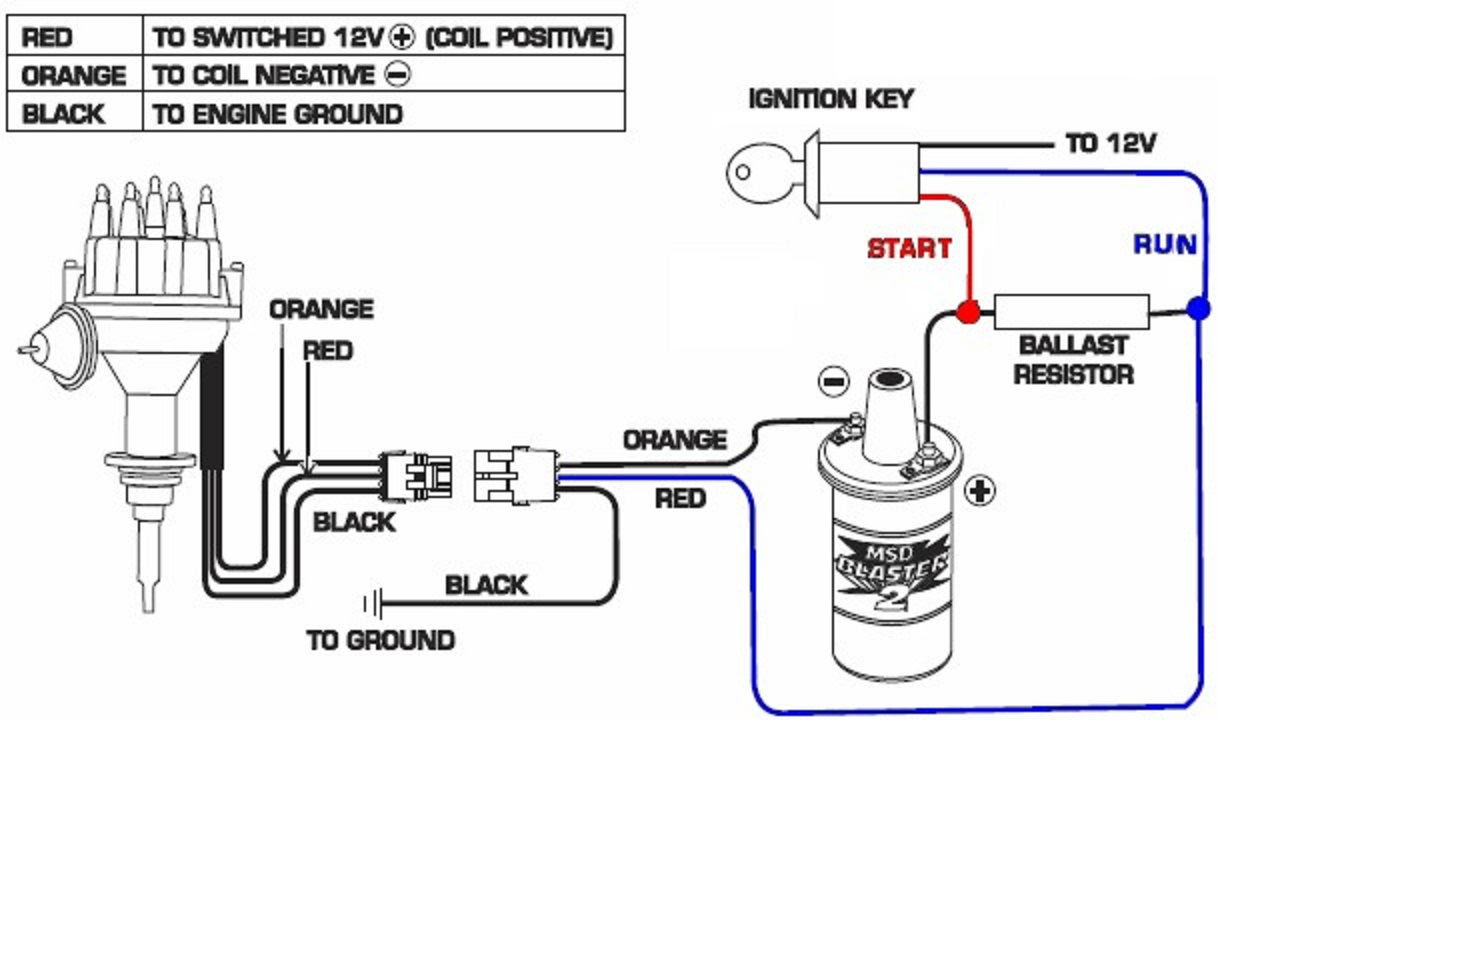 1968 Ford F100 Ignition Coil Wiring Diagram Underfloor Heating Wiring Diagram Controls Vga Yenpancane Jeanjaures37 Fr